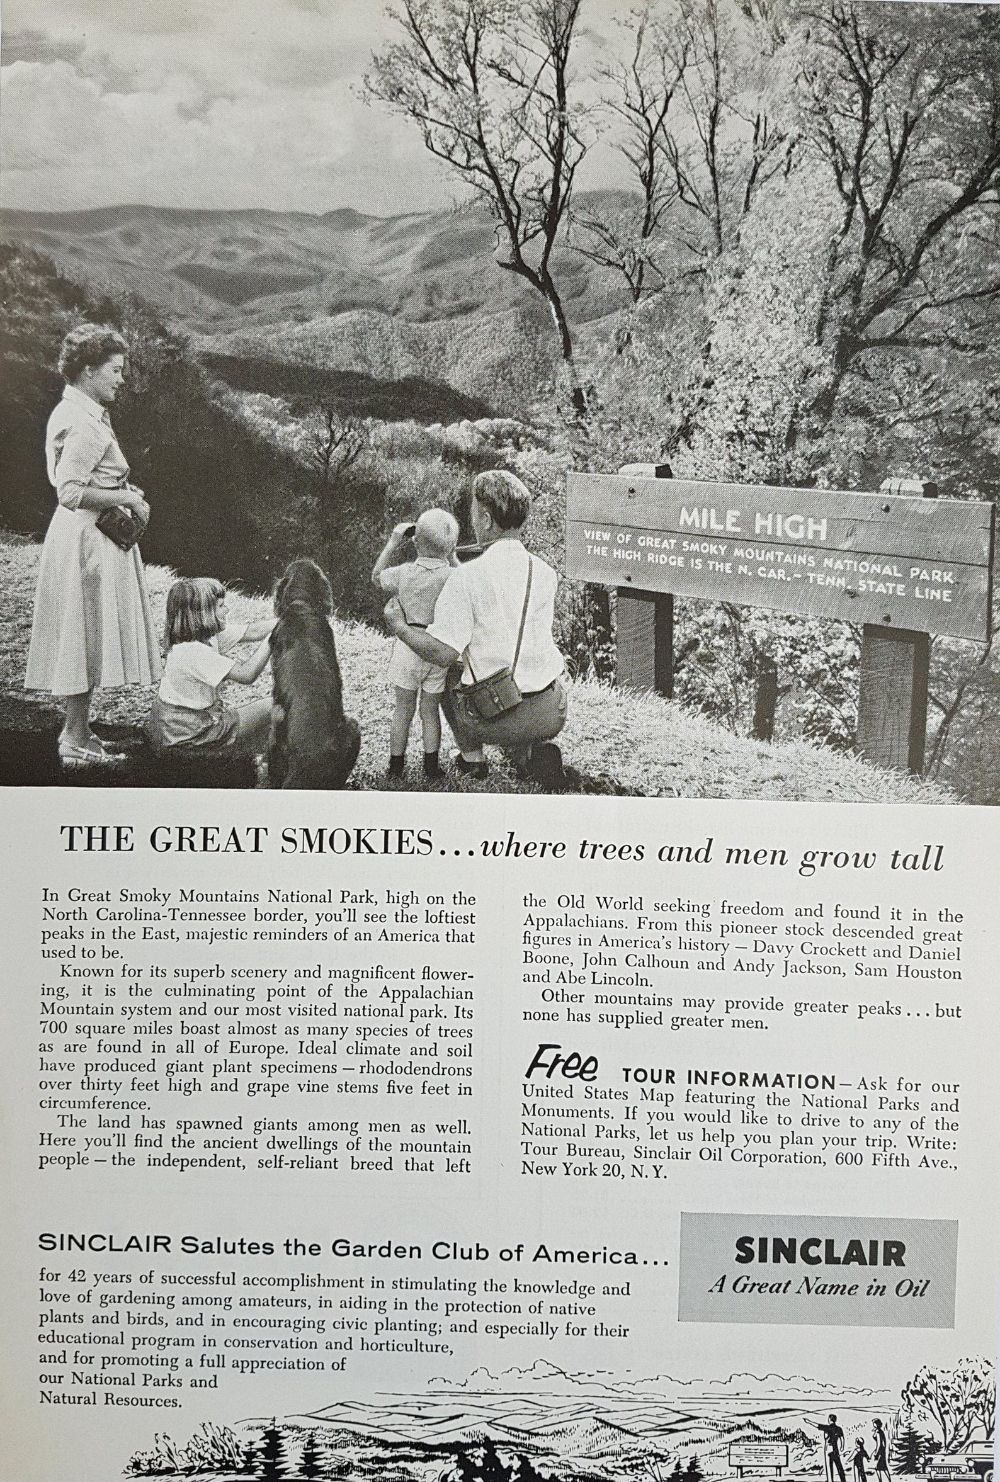 1955 Sinclair Oil Corporation Ad Original Magazine Ad Retro Ad The Greatest Smokies Where Trees And Men Grow Tall Magazine Ads How To Grow Taller Retro Ads